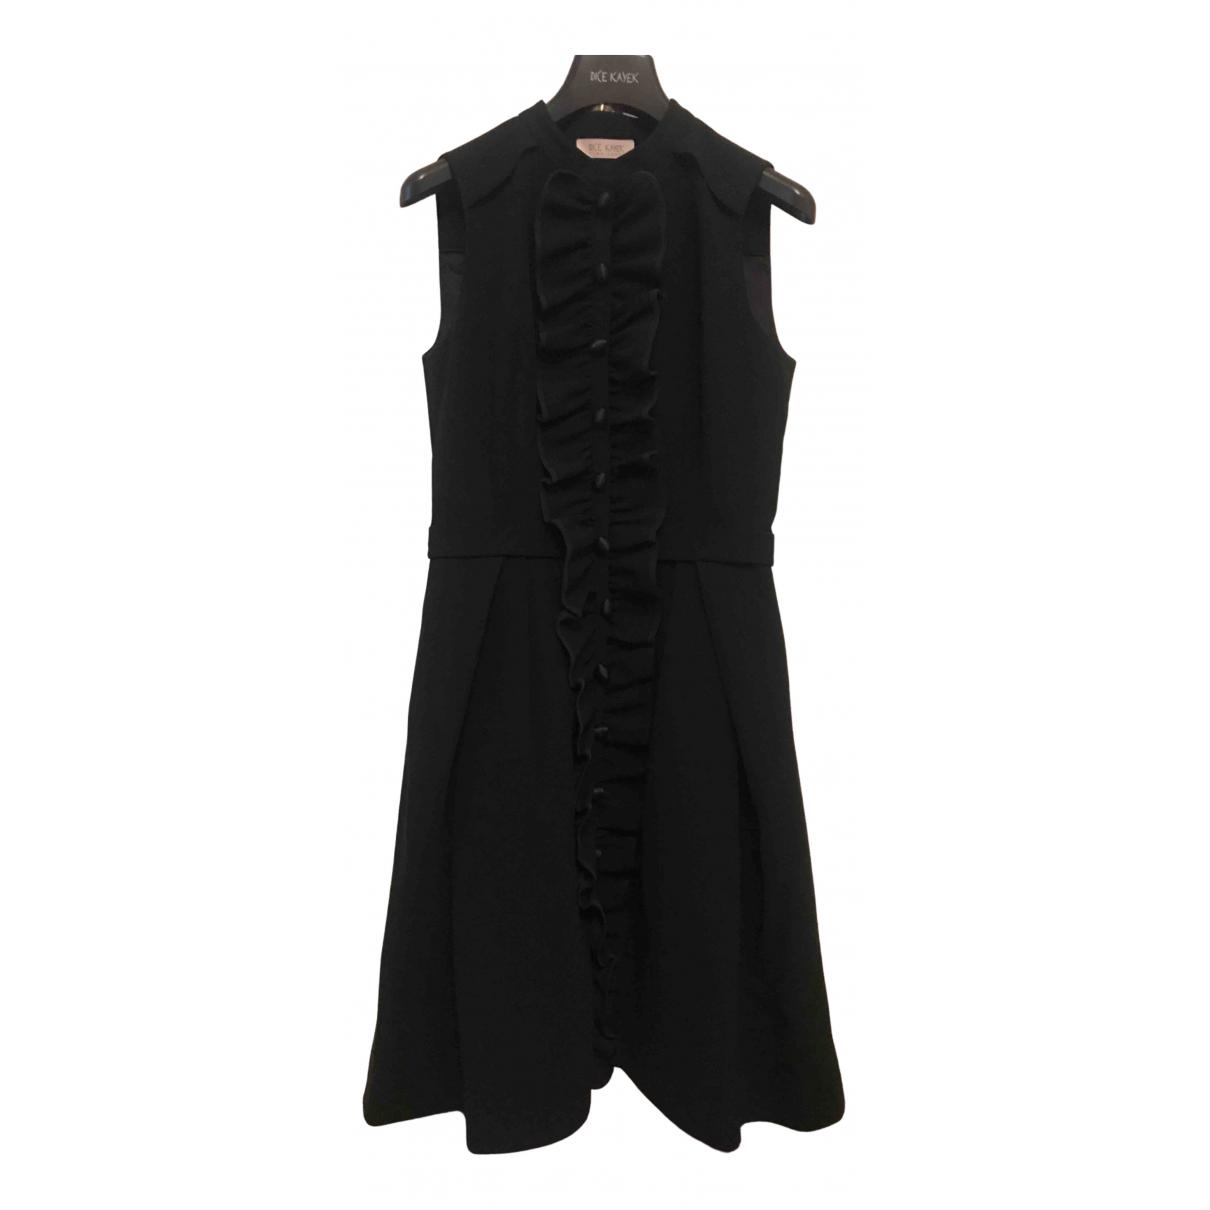 Dice Kayek - Robe   pour femme en coton - elasthane - noir